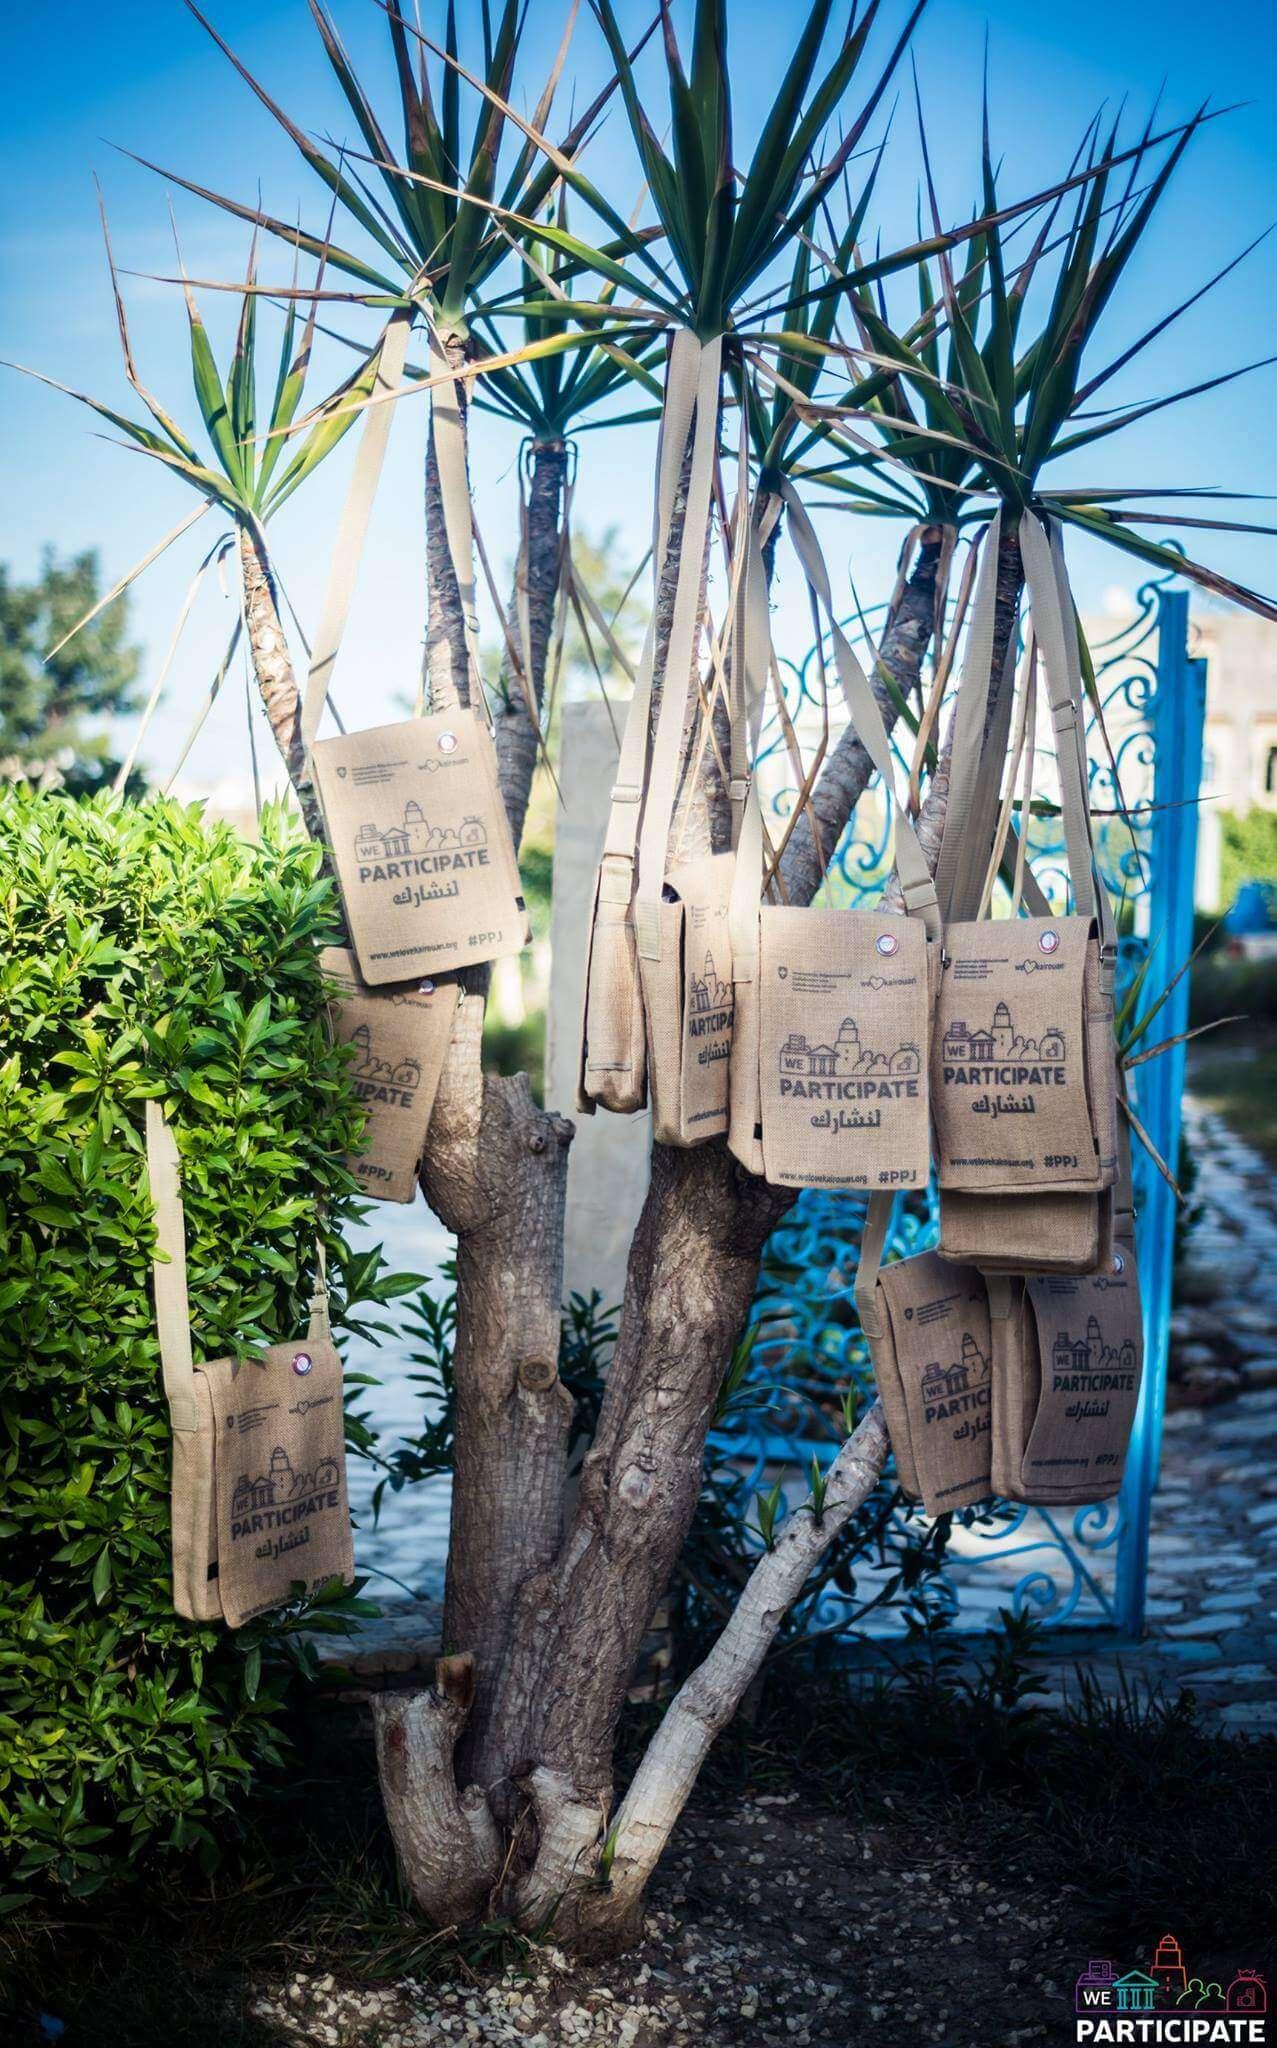 We participate we love kairouan event bag